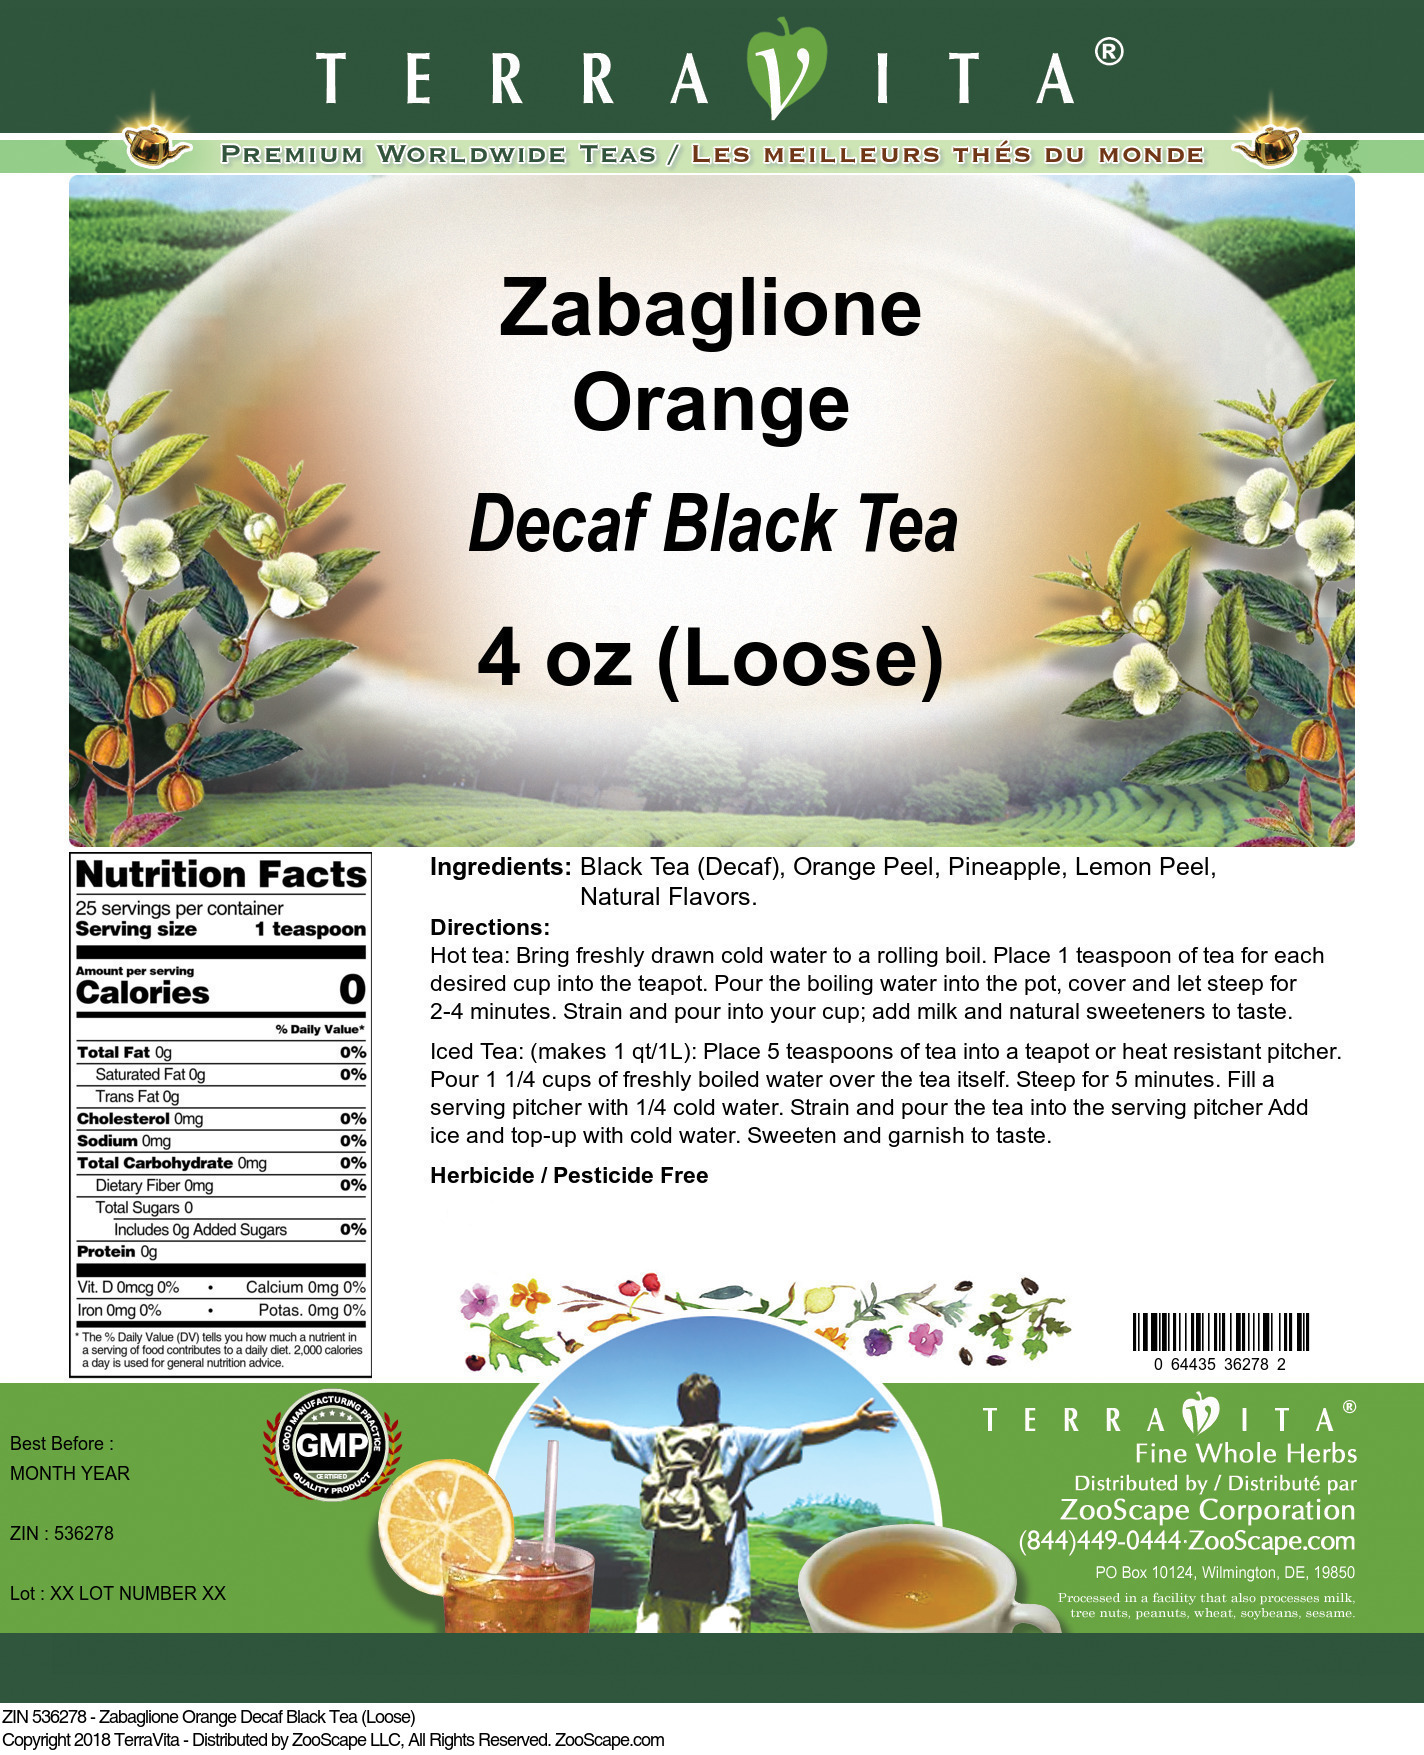 Zabaglione Orange Decaf Black Tea (Loose)